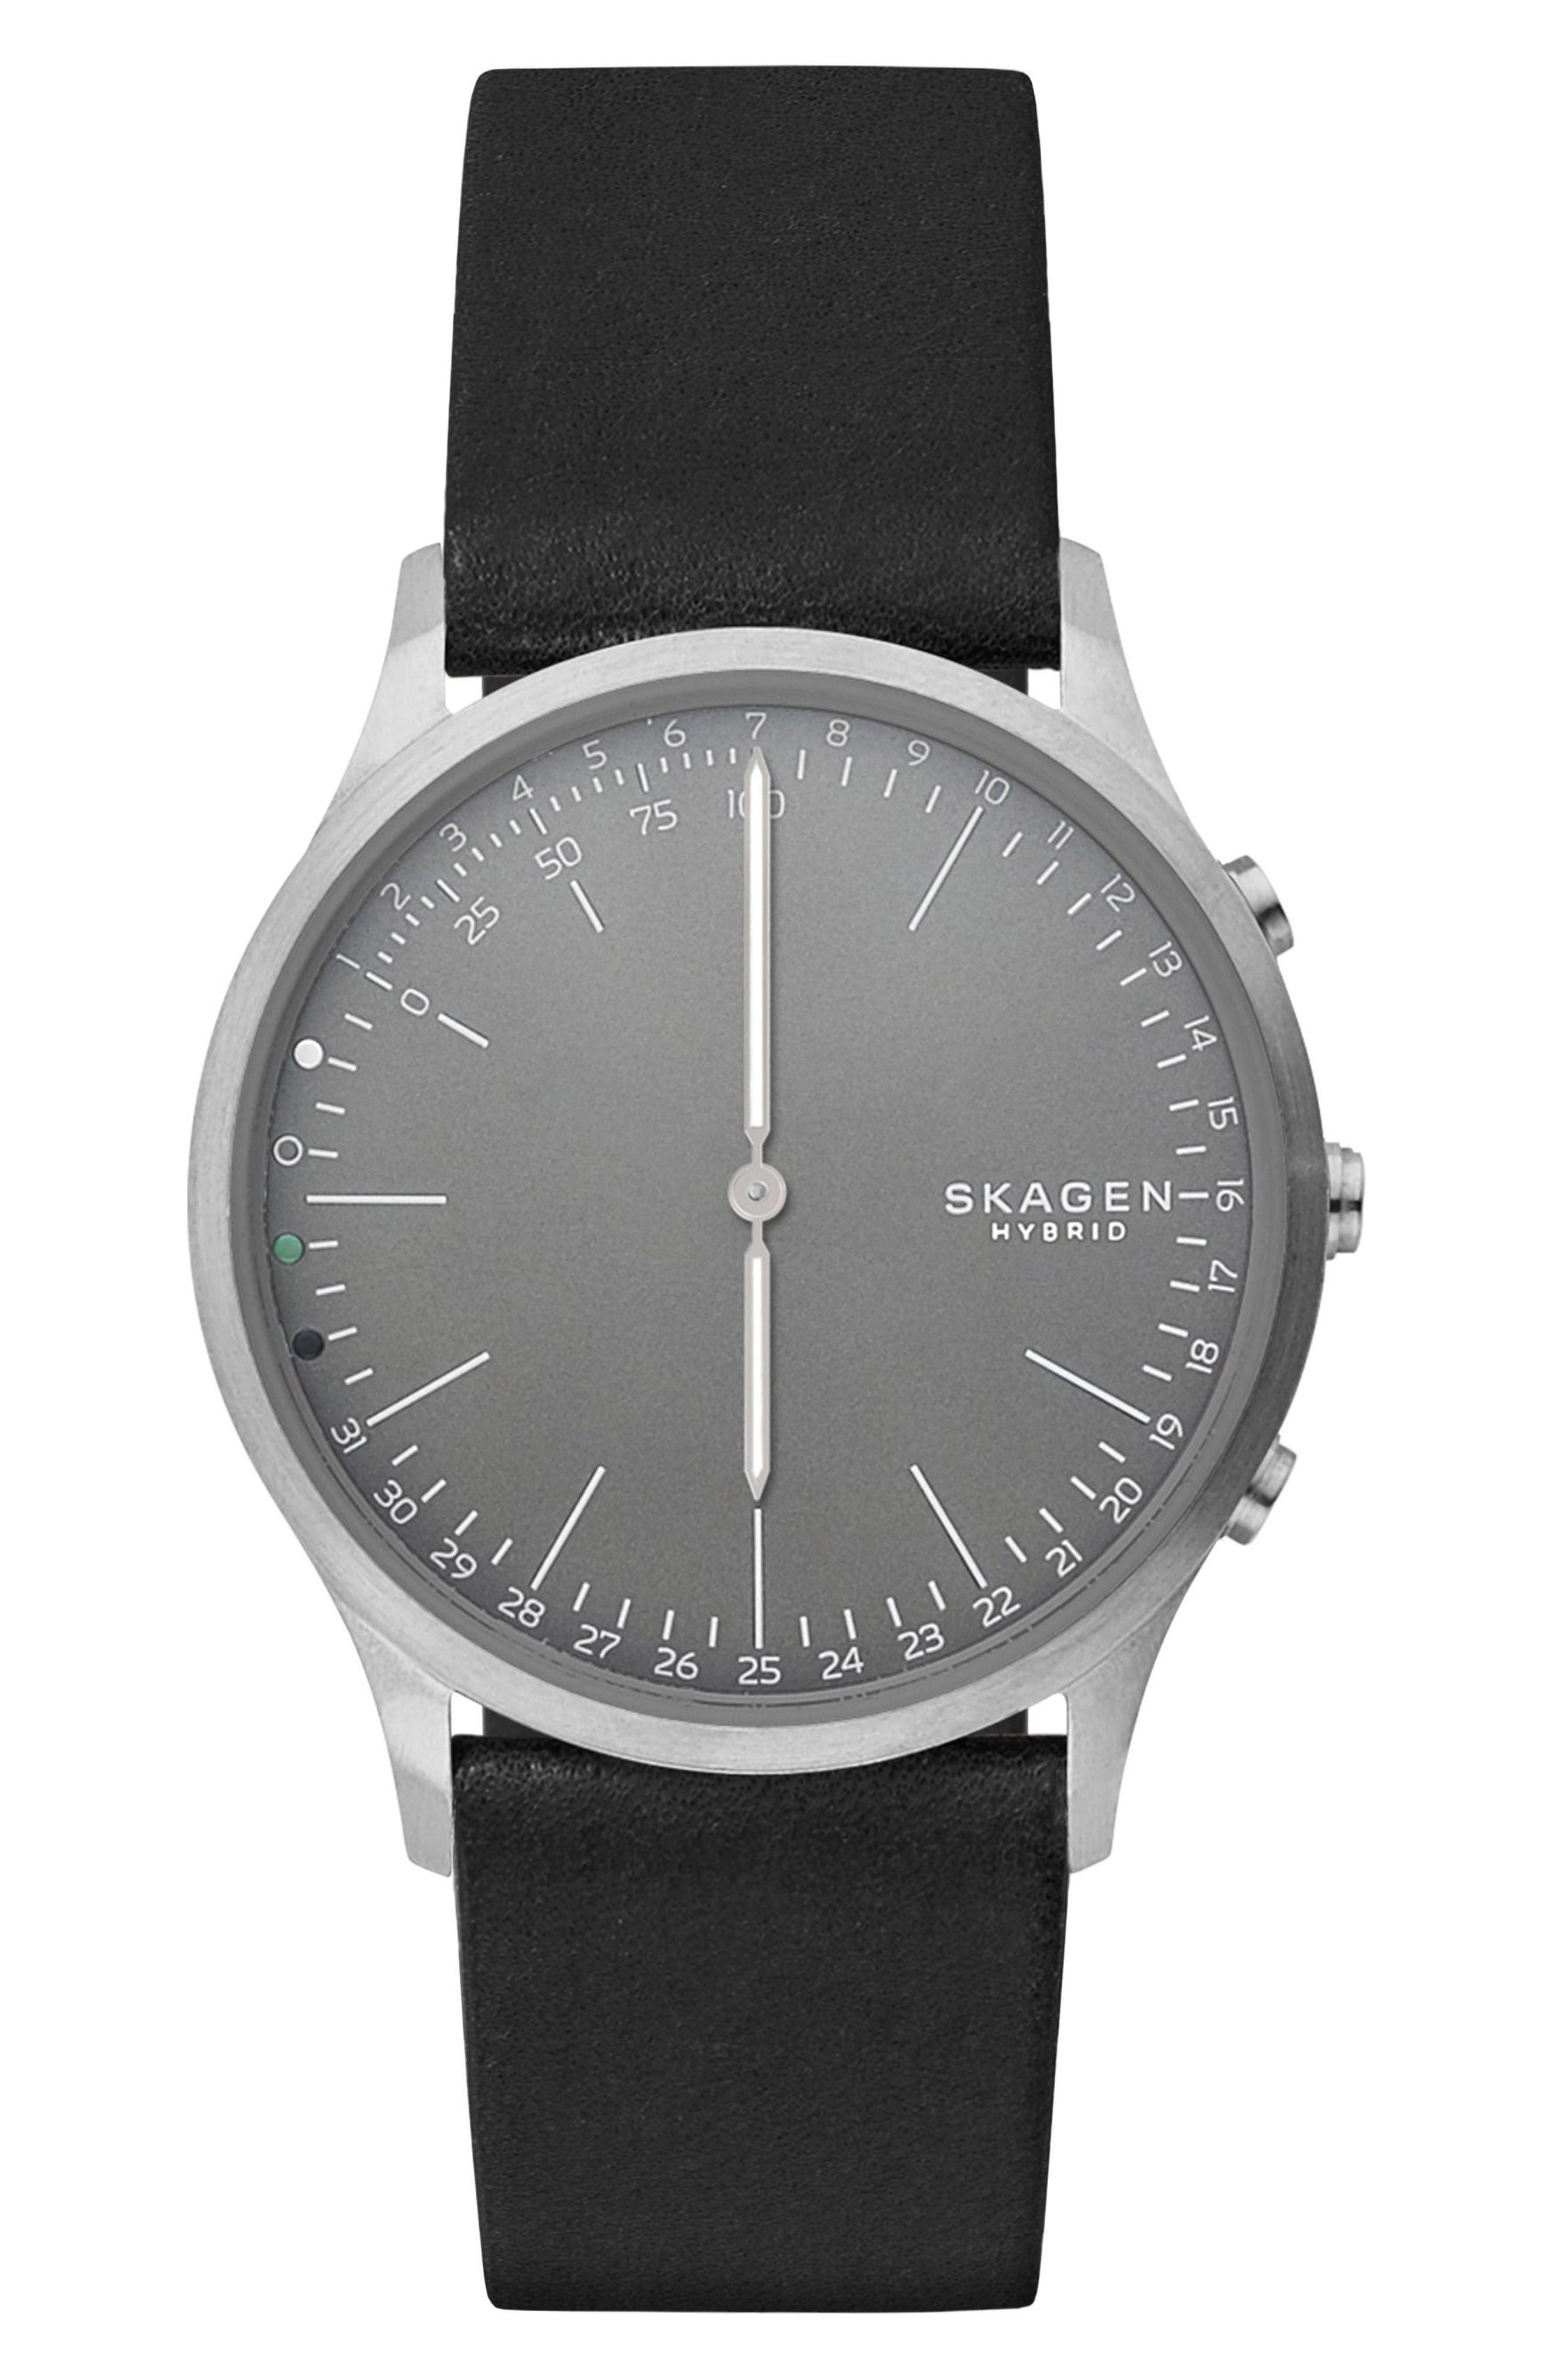 Main Image - Skagen Jorn Hybrid Leather Strap Smart Watch, 41mm